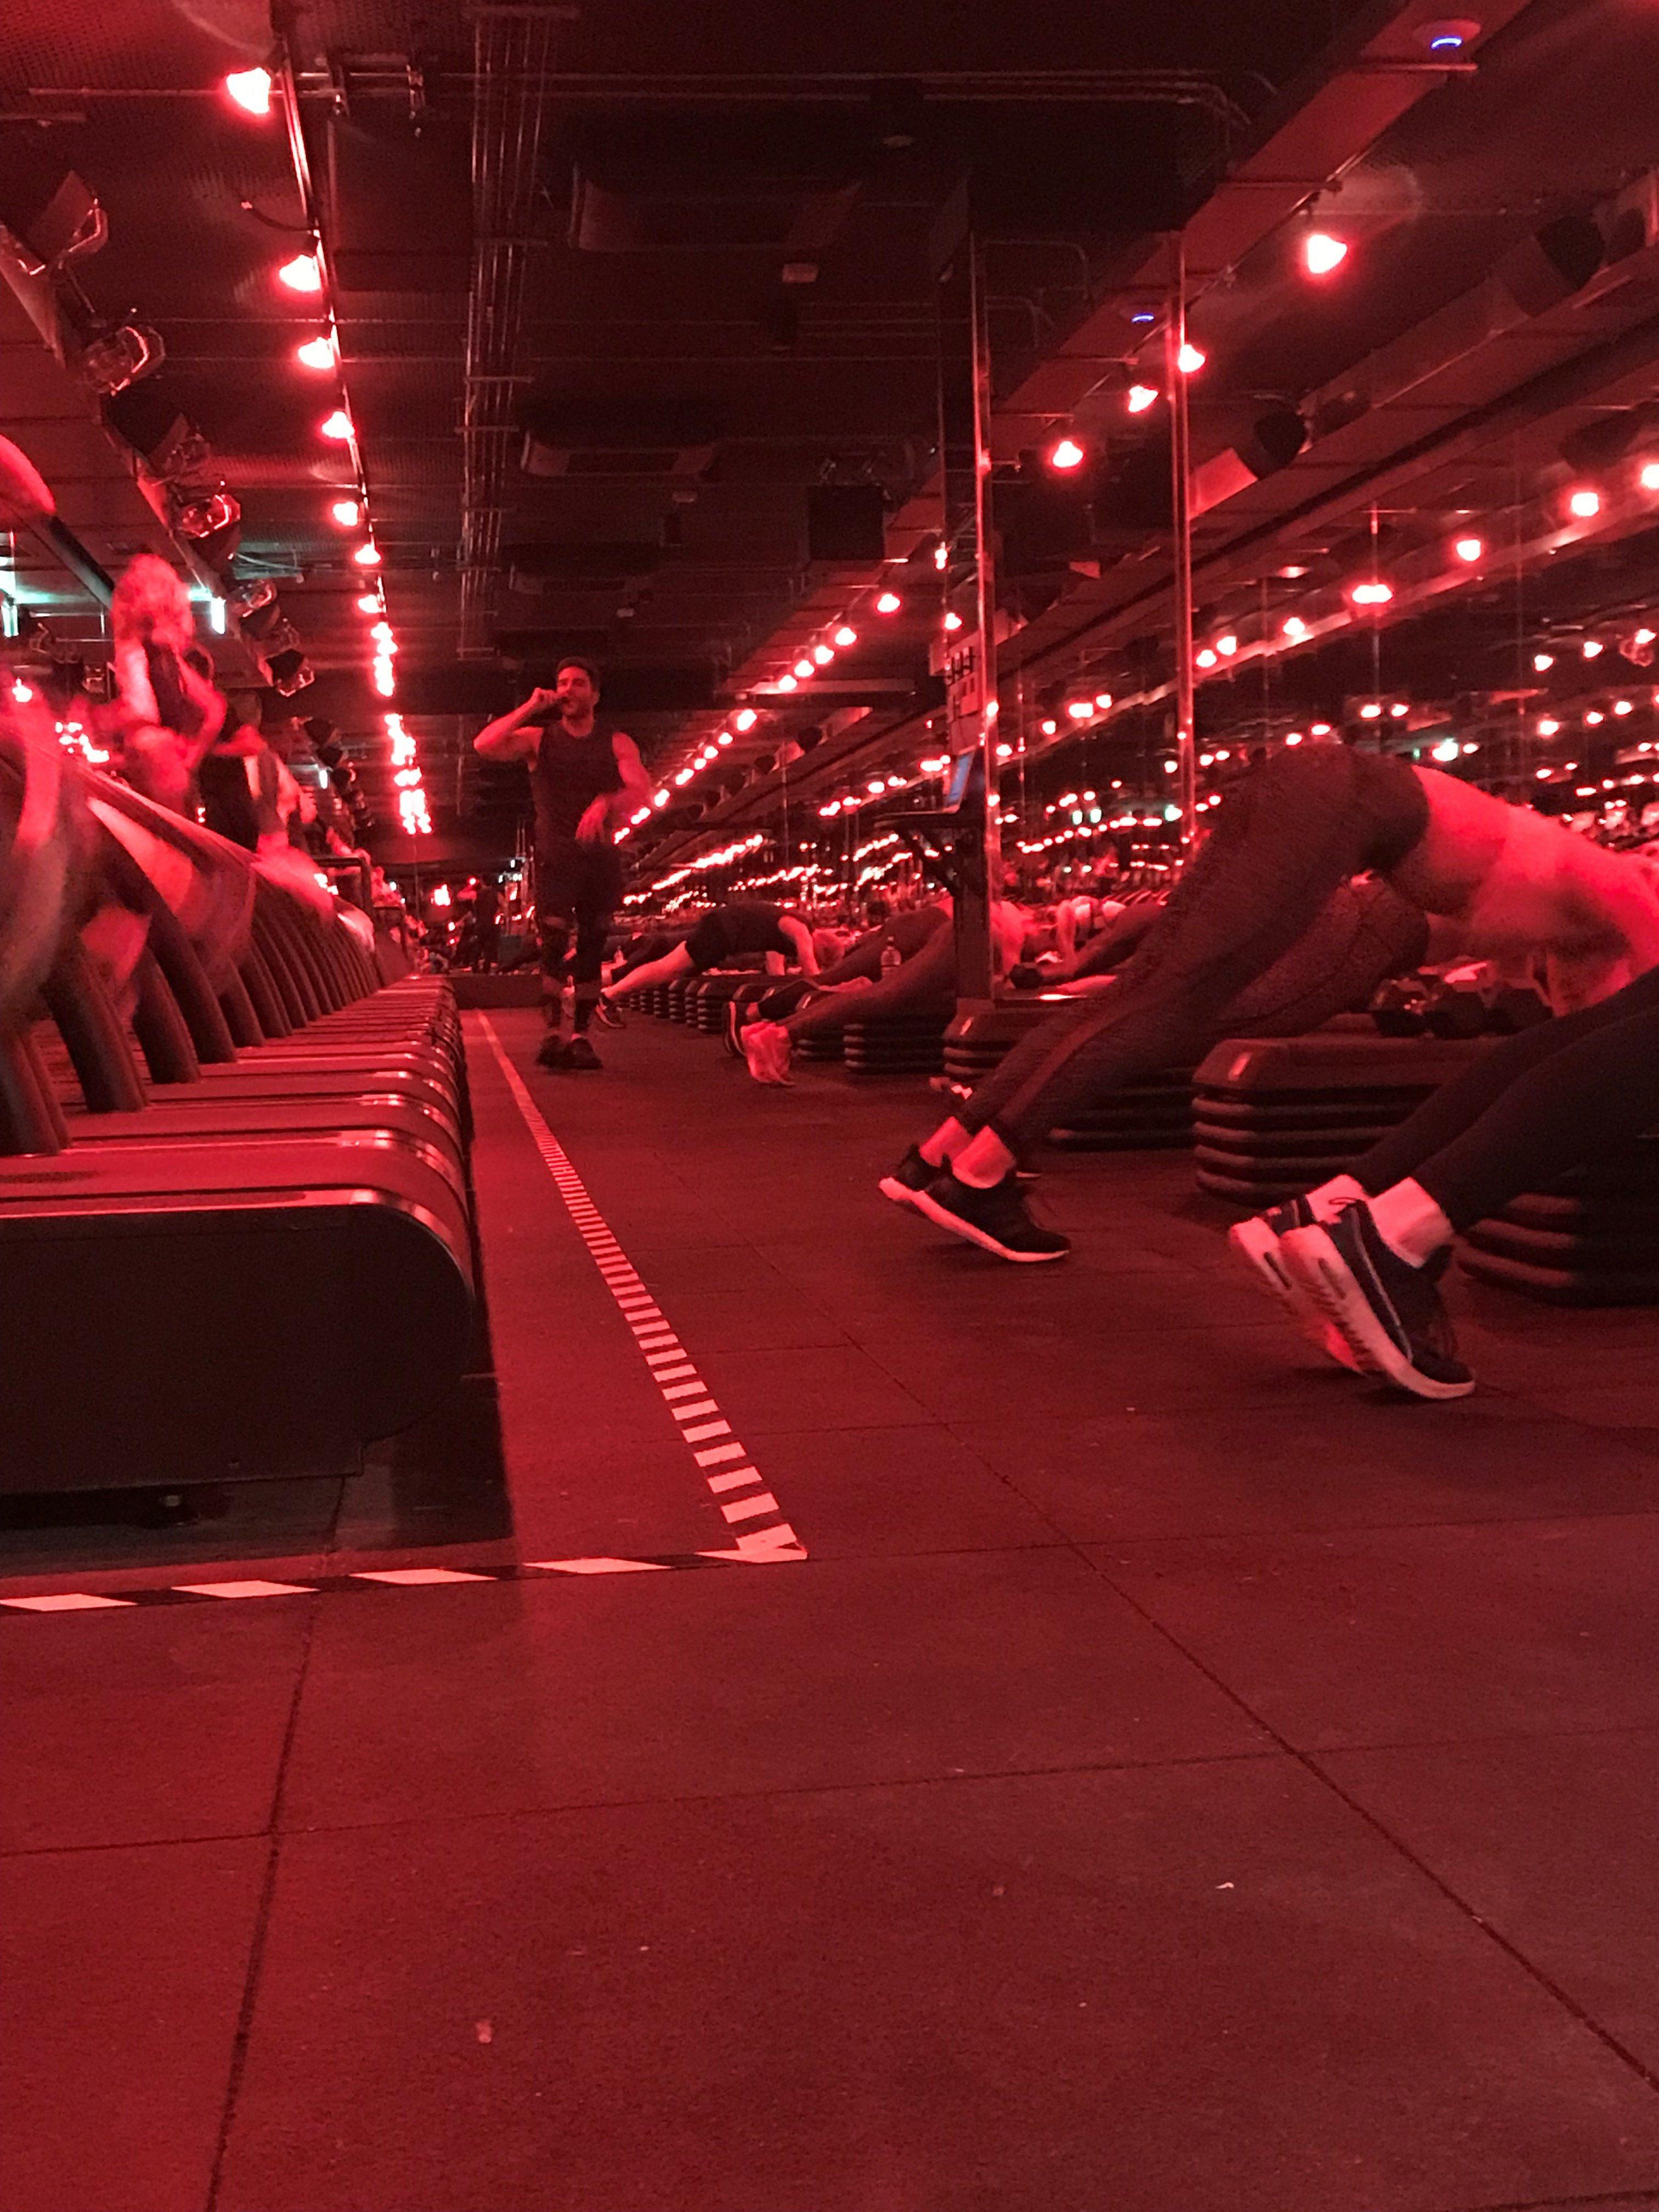 red lit gym (Liz Connor/PA)